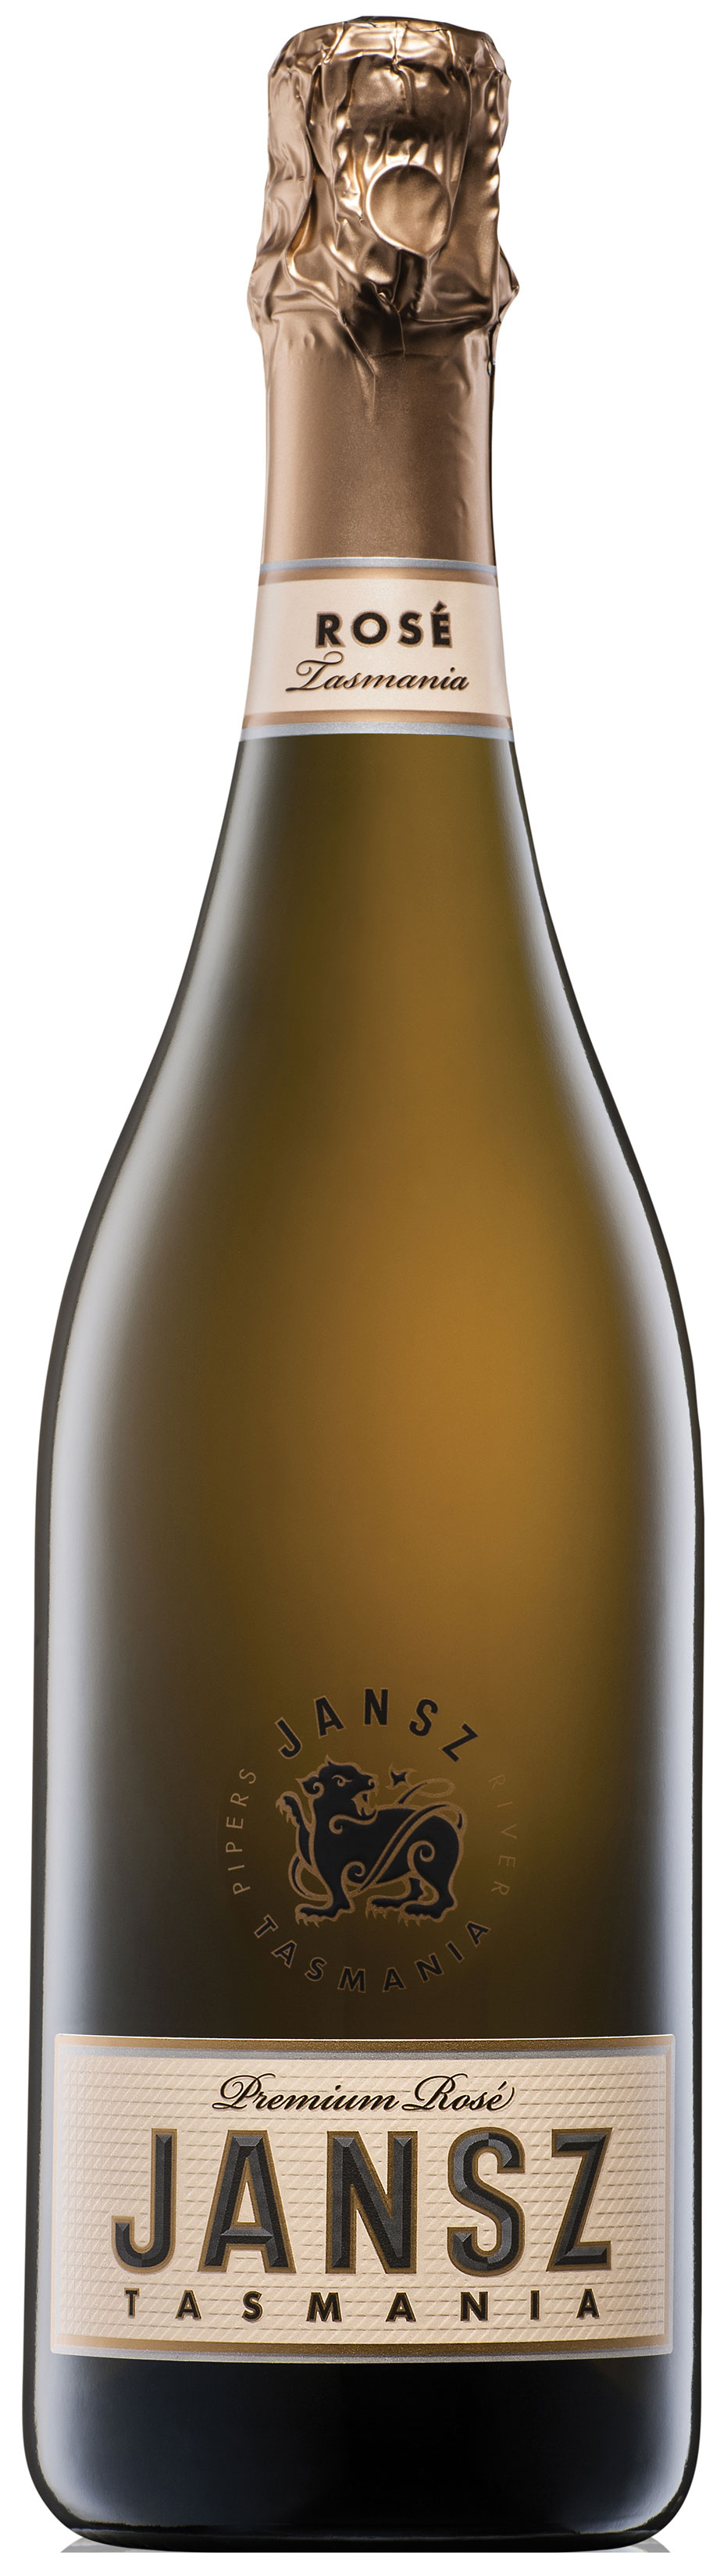 https://vinocorpperu.com/images/vinos/jansz/janz_tasmania_premium_rose_nv.jpg